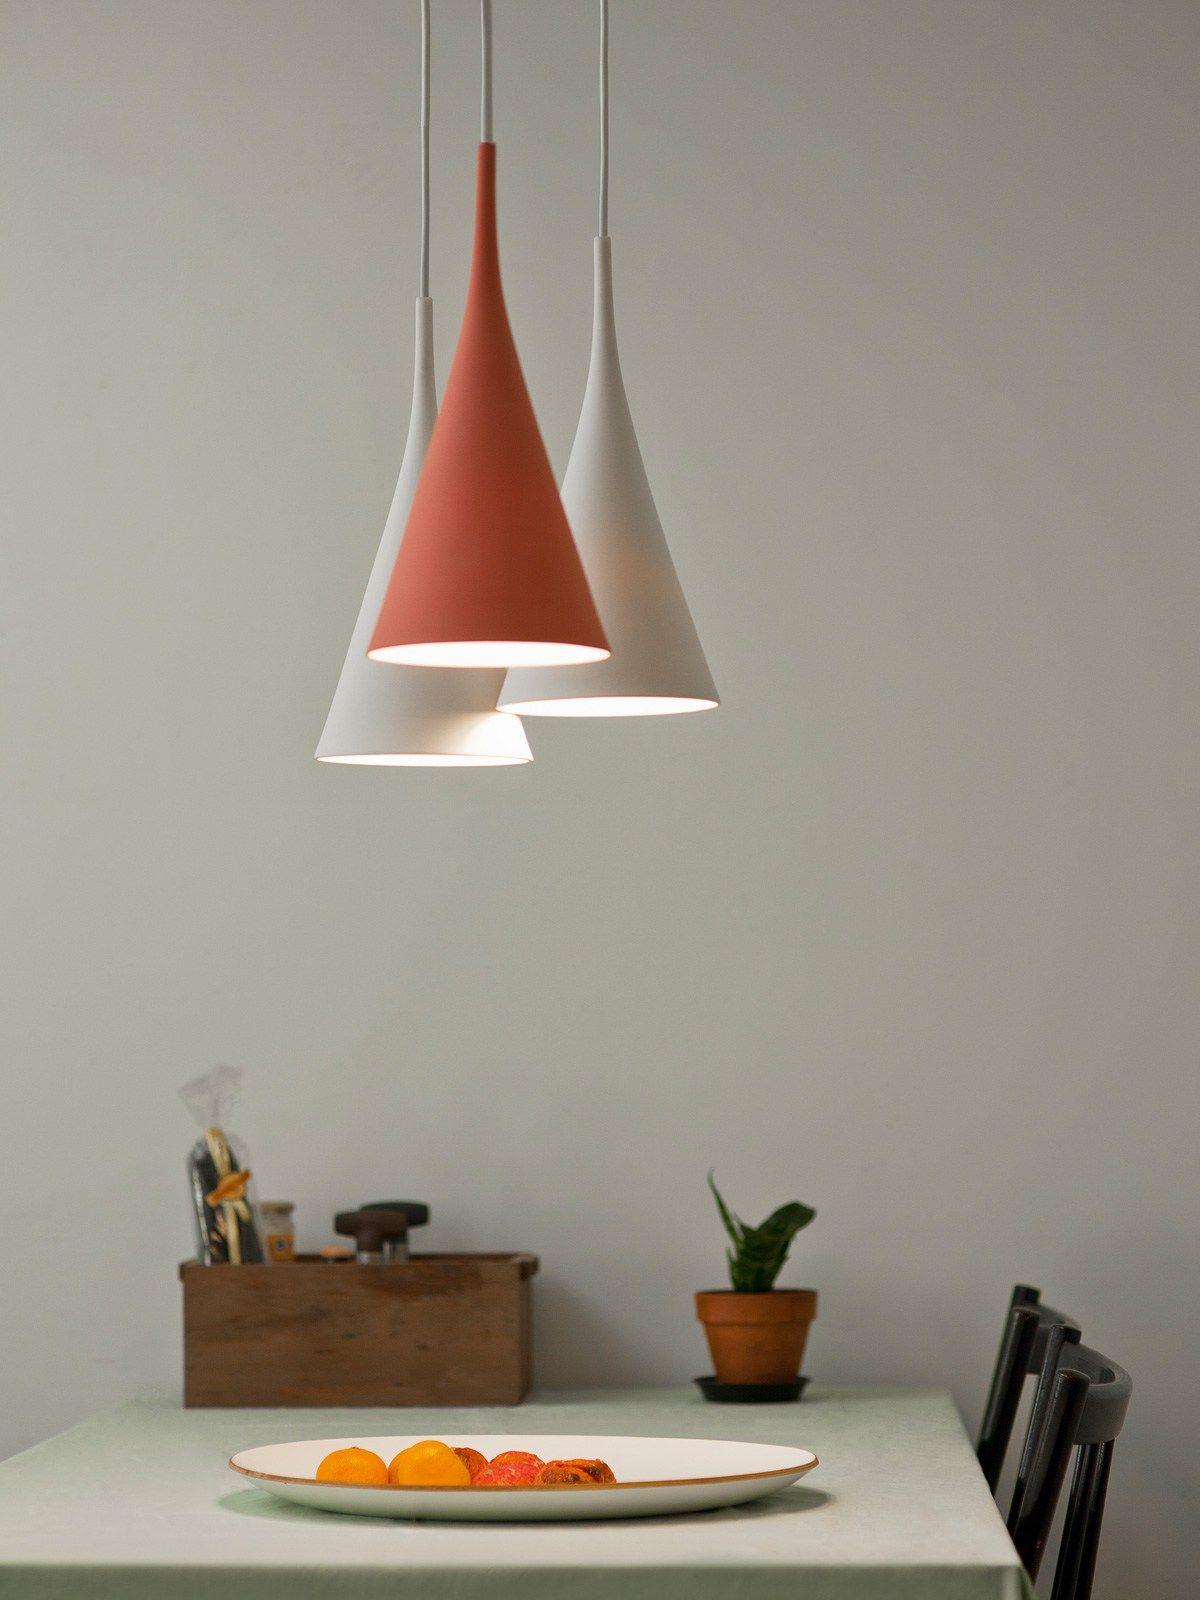 Lambada In 2019 Lampen Aus Naturmaterialien Natural Materials